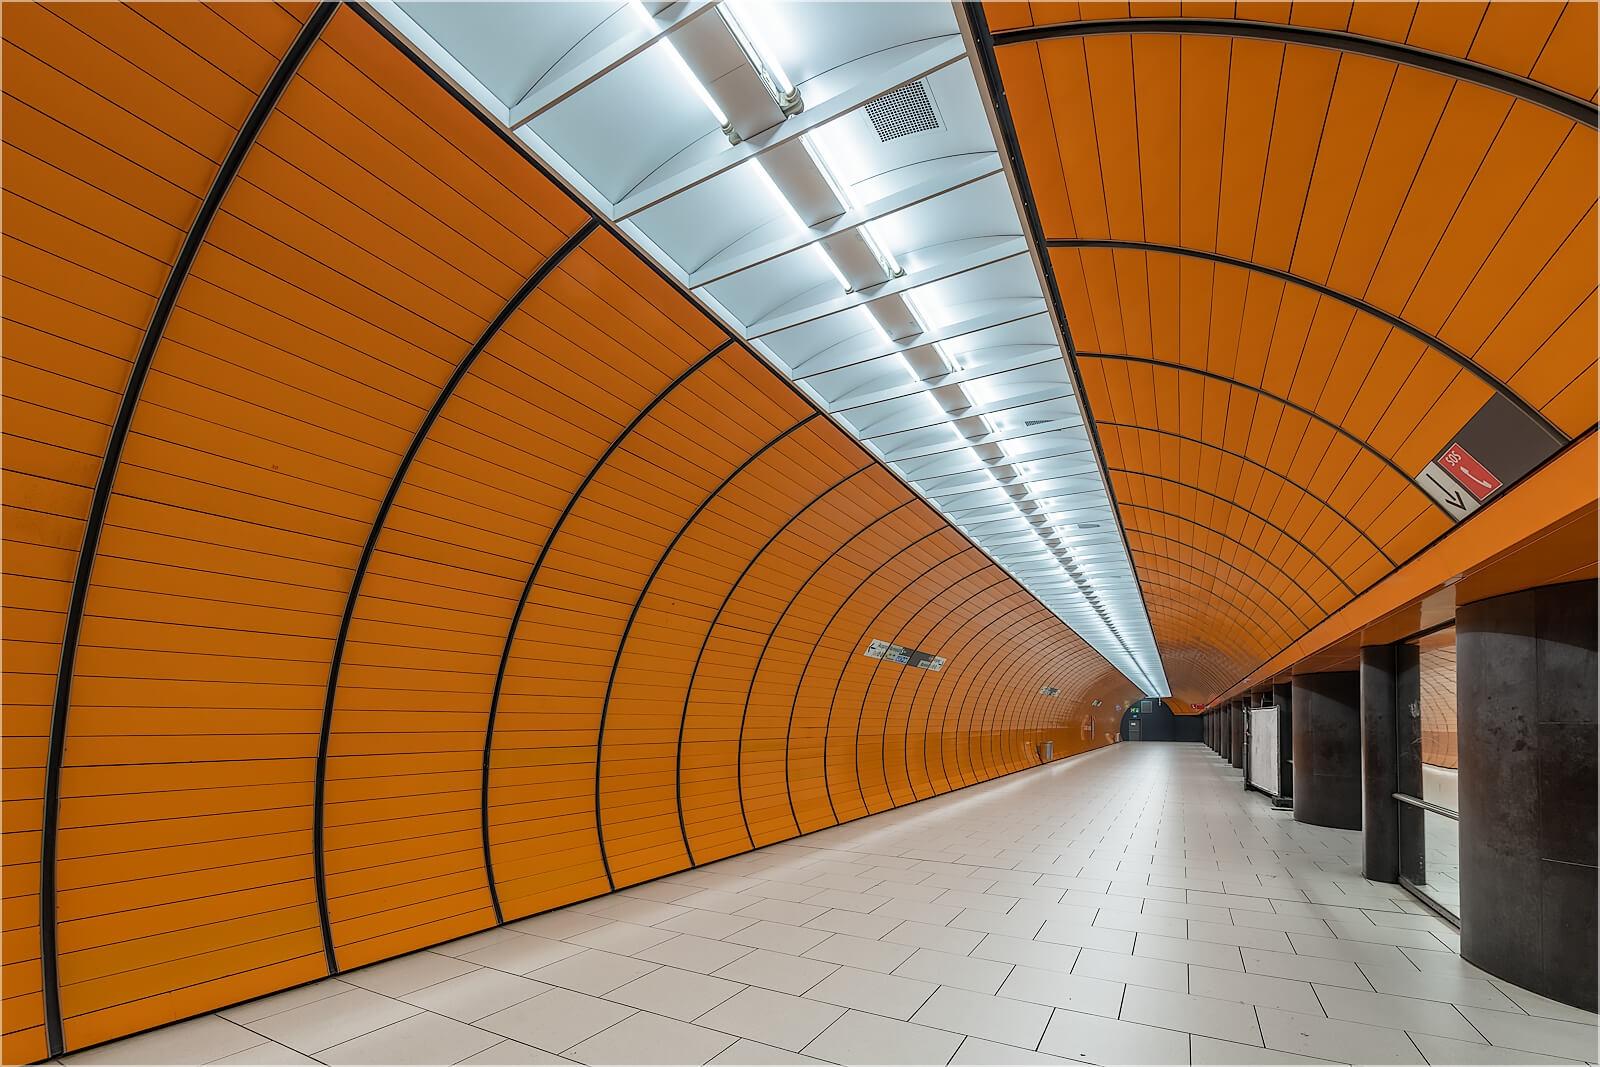 Wandbild Perspektive im Tunnel